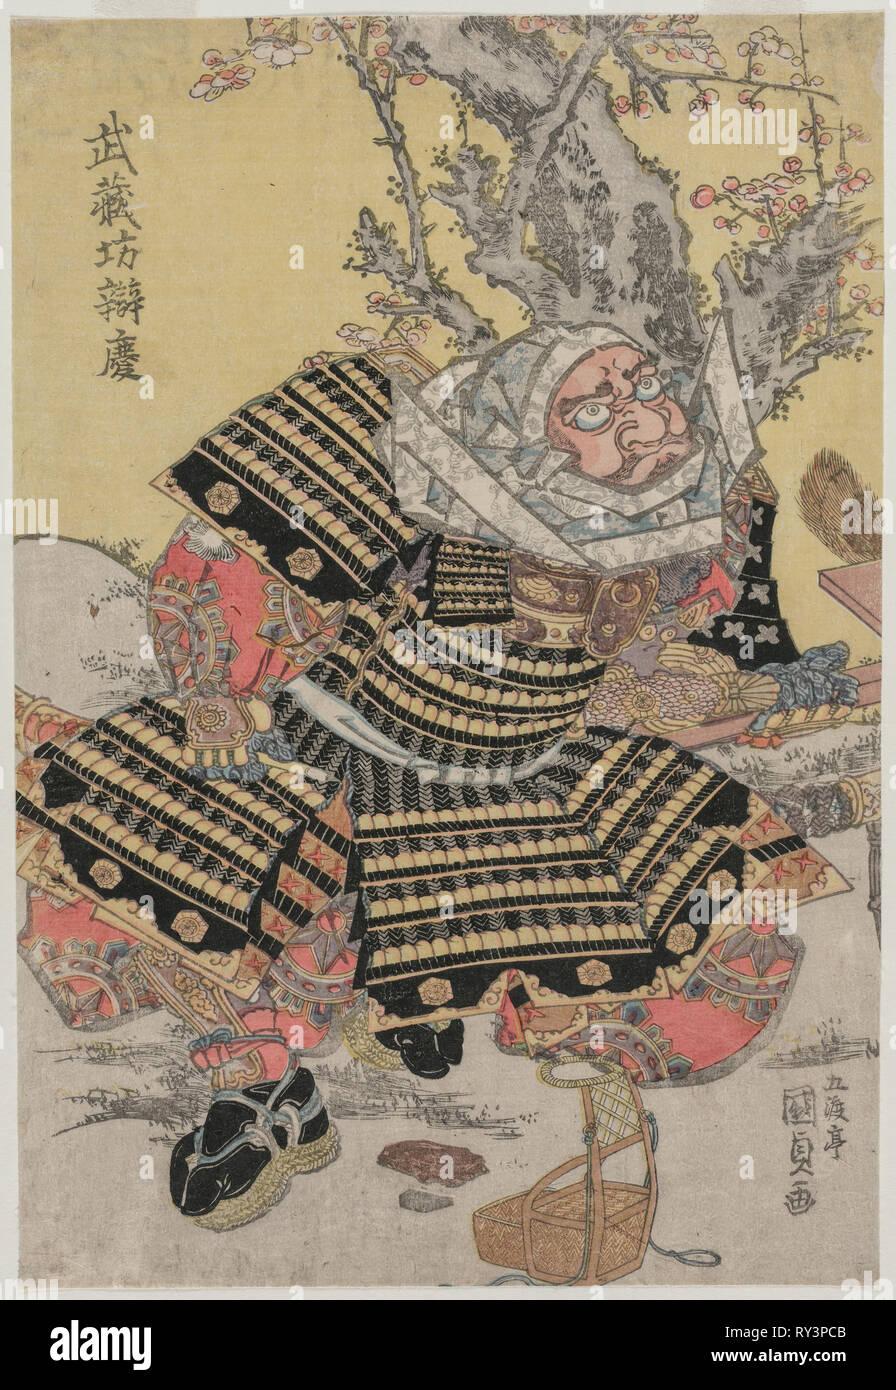 Musashibo Benkei Kneeling by a Plum Tree, c. mid or late 1810s. Gototei Kunisada (Japanese, 1786-1864). Color woodblock print; sheet: 37.5 x 25.4 cm (14 3/4 x 10 in - Stock Image